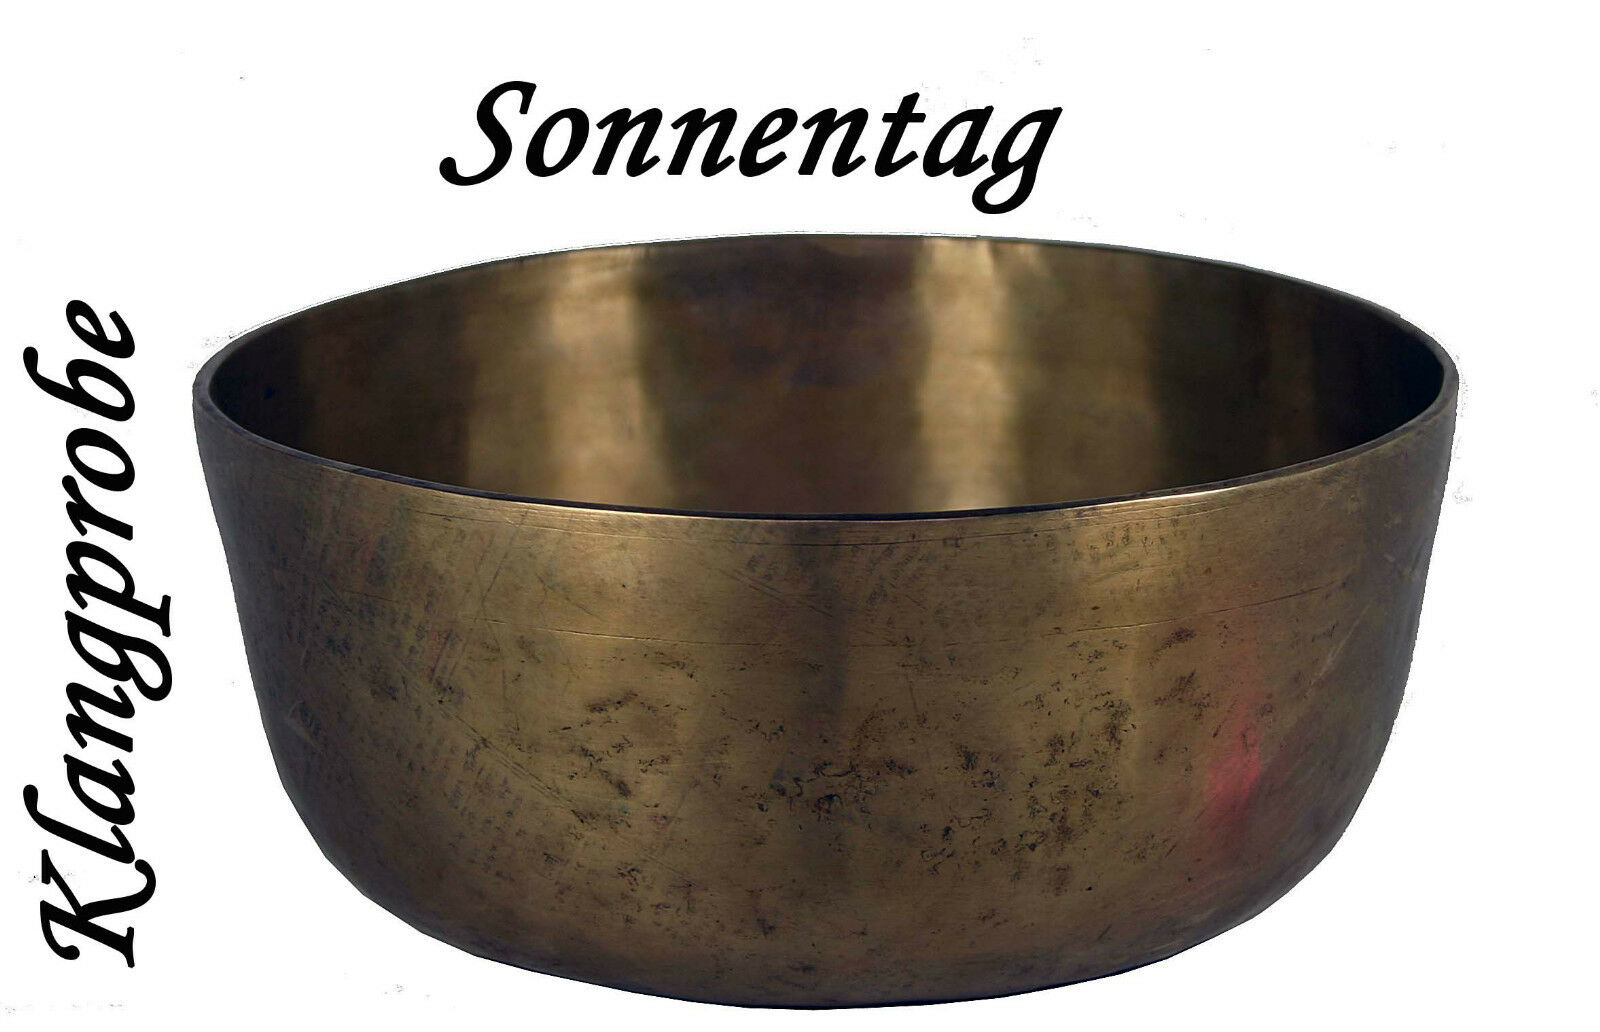 Klangschale Singing Bowl   Erde Sonnentag    Hörprobe   1754g  M80-120